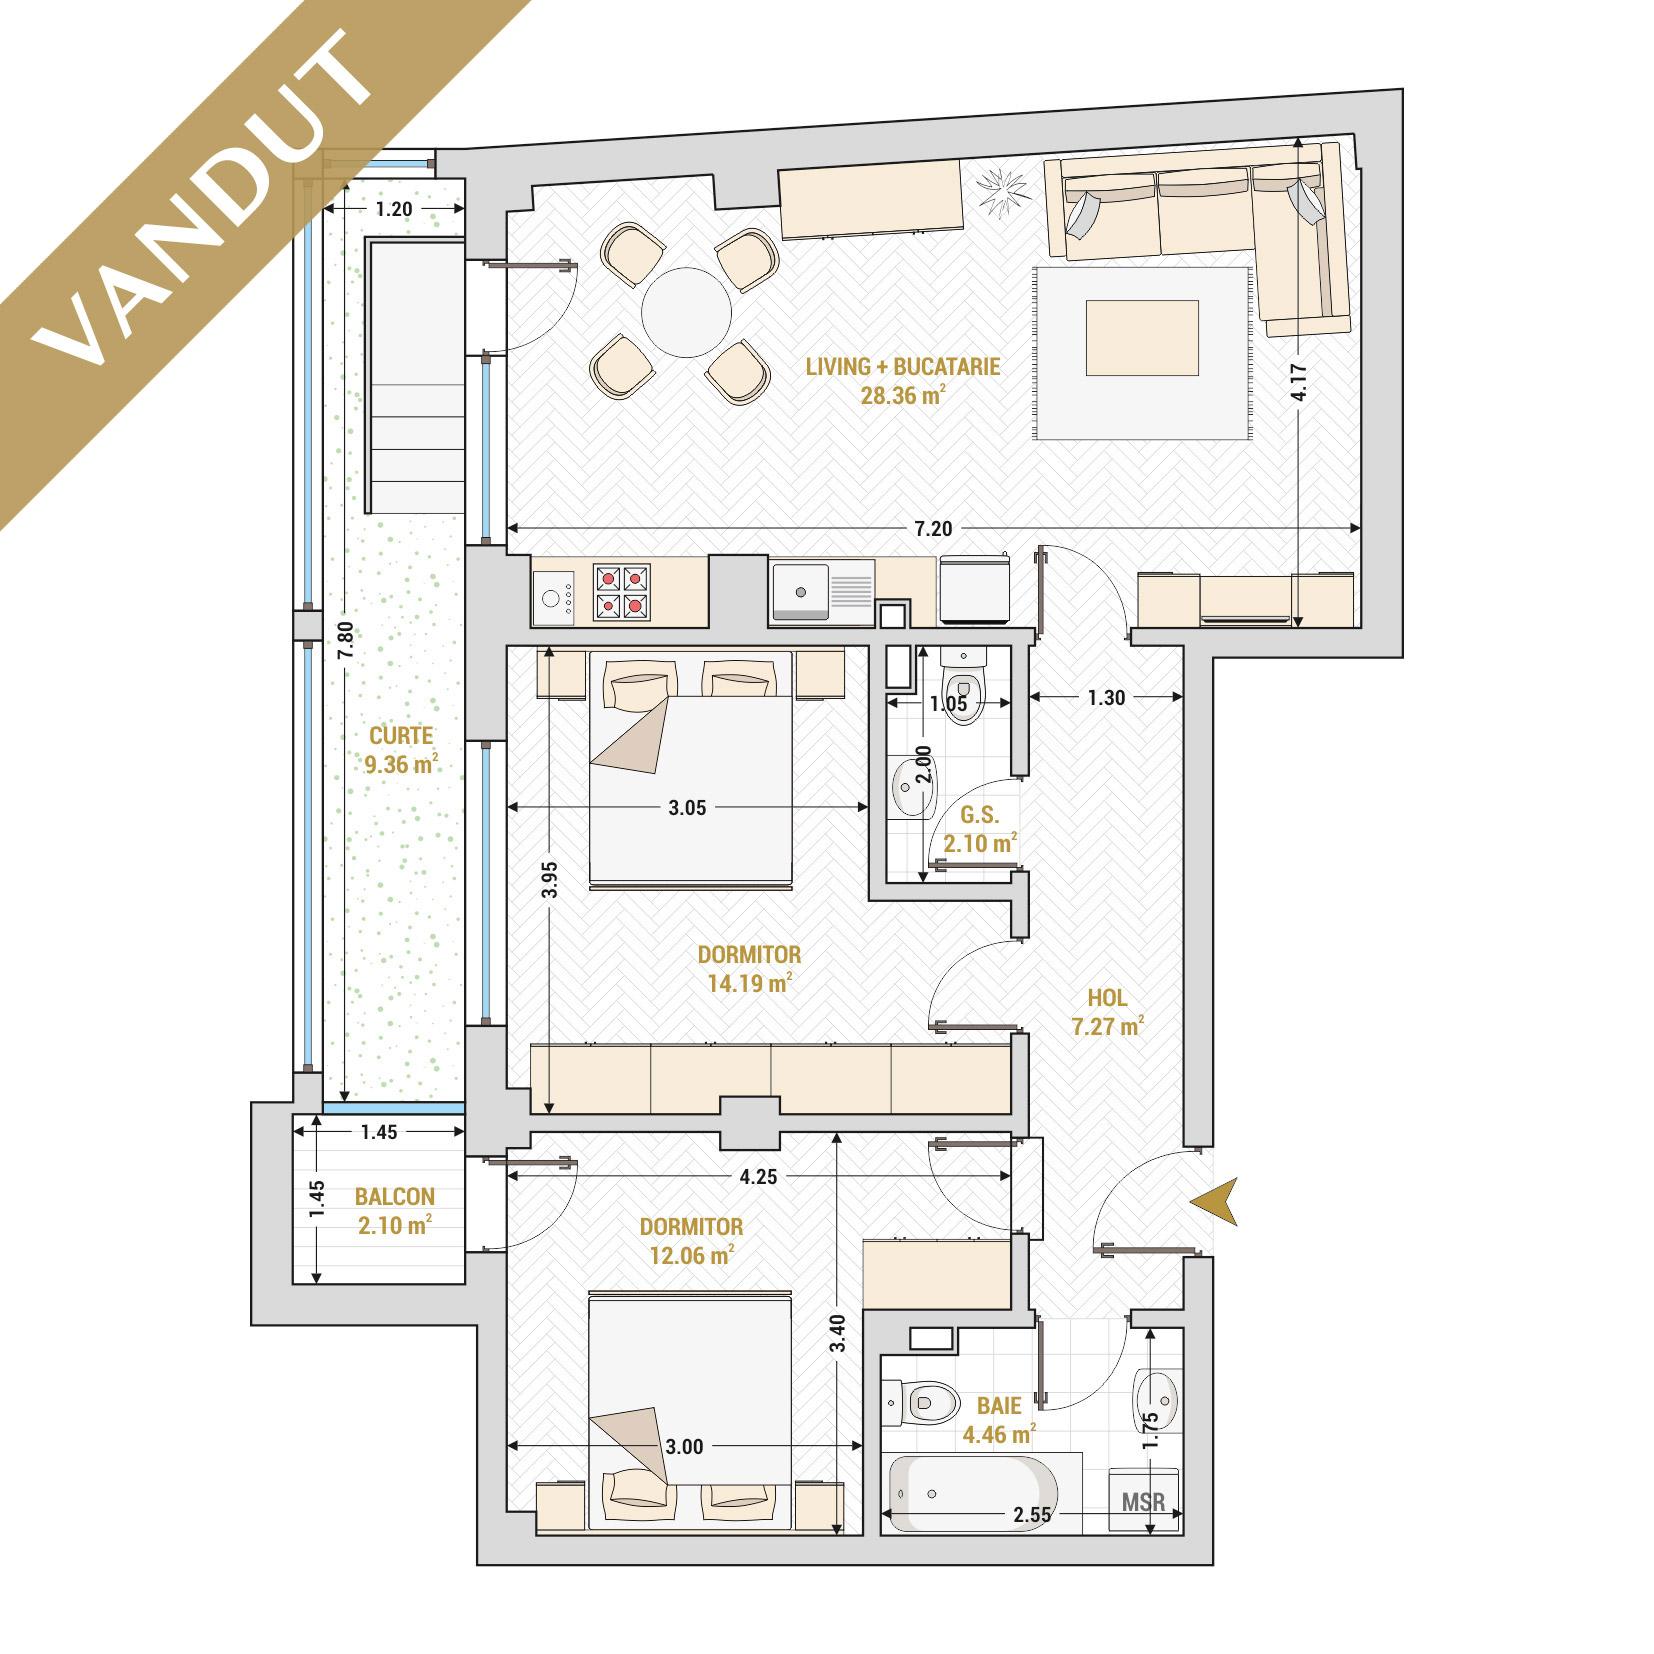 Apartament 3 camere de vanzare Bucuresti - Catedral Residence - Marriott, Piata Unirii, 13 Septembrie, Izvor - Tip 3 - T2 - S